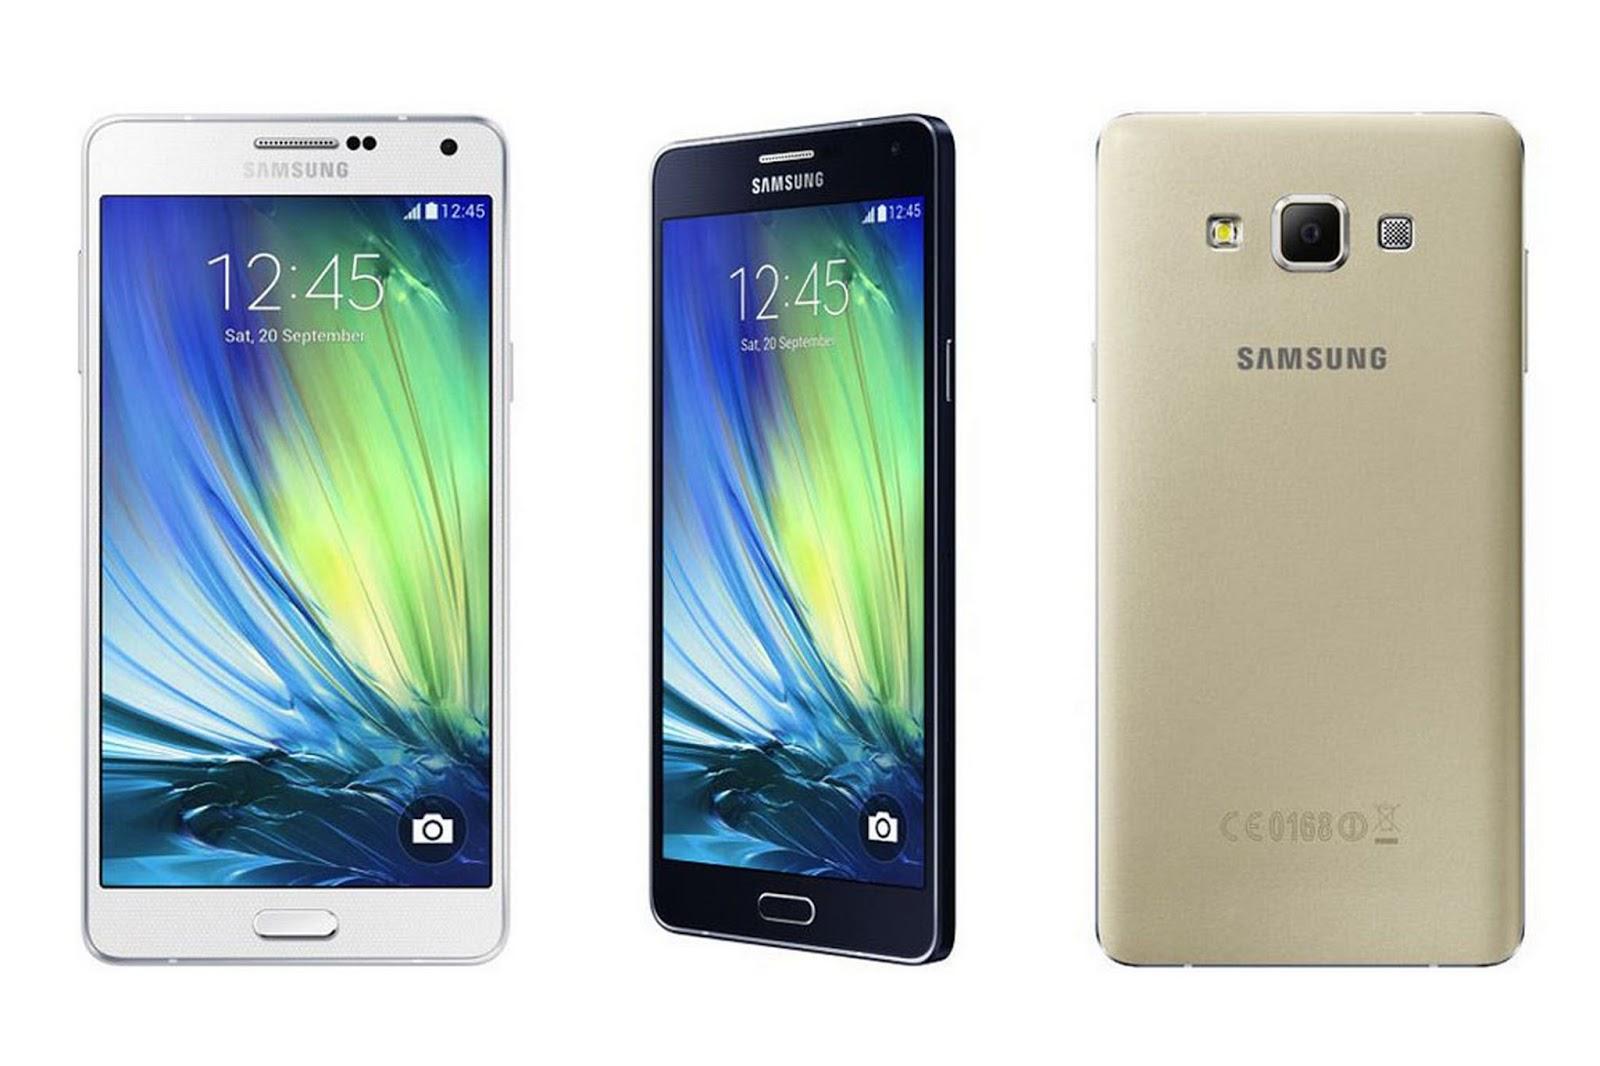 Hd Wallpaper Free 4u Sumsung Galaxy A7 Hd Wallpapers Free Download